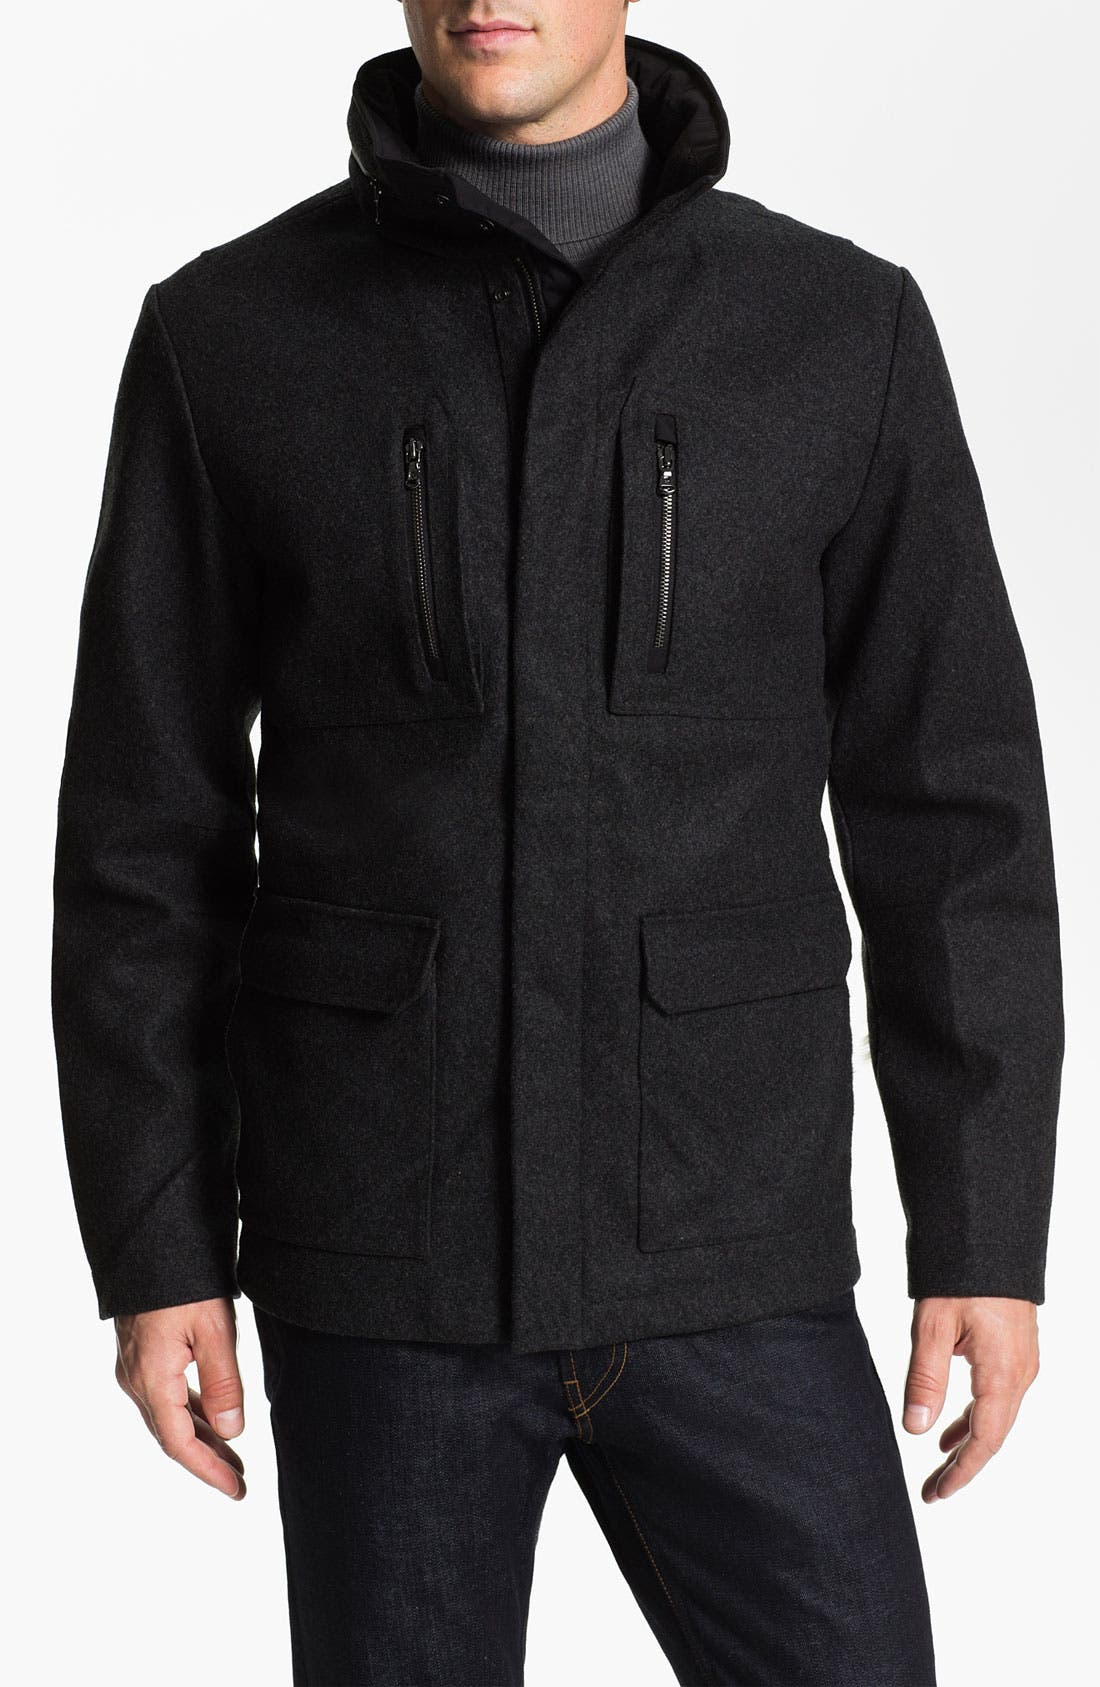 Main Image - Victorinox Swiss Army® 'Explorer' Wool Blend Jacket